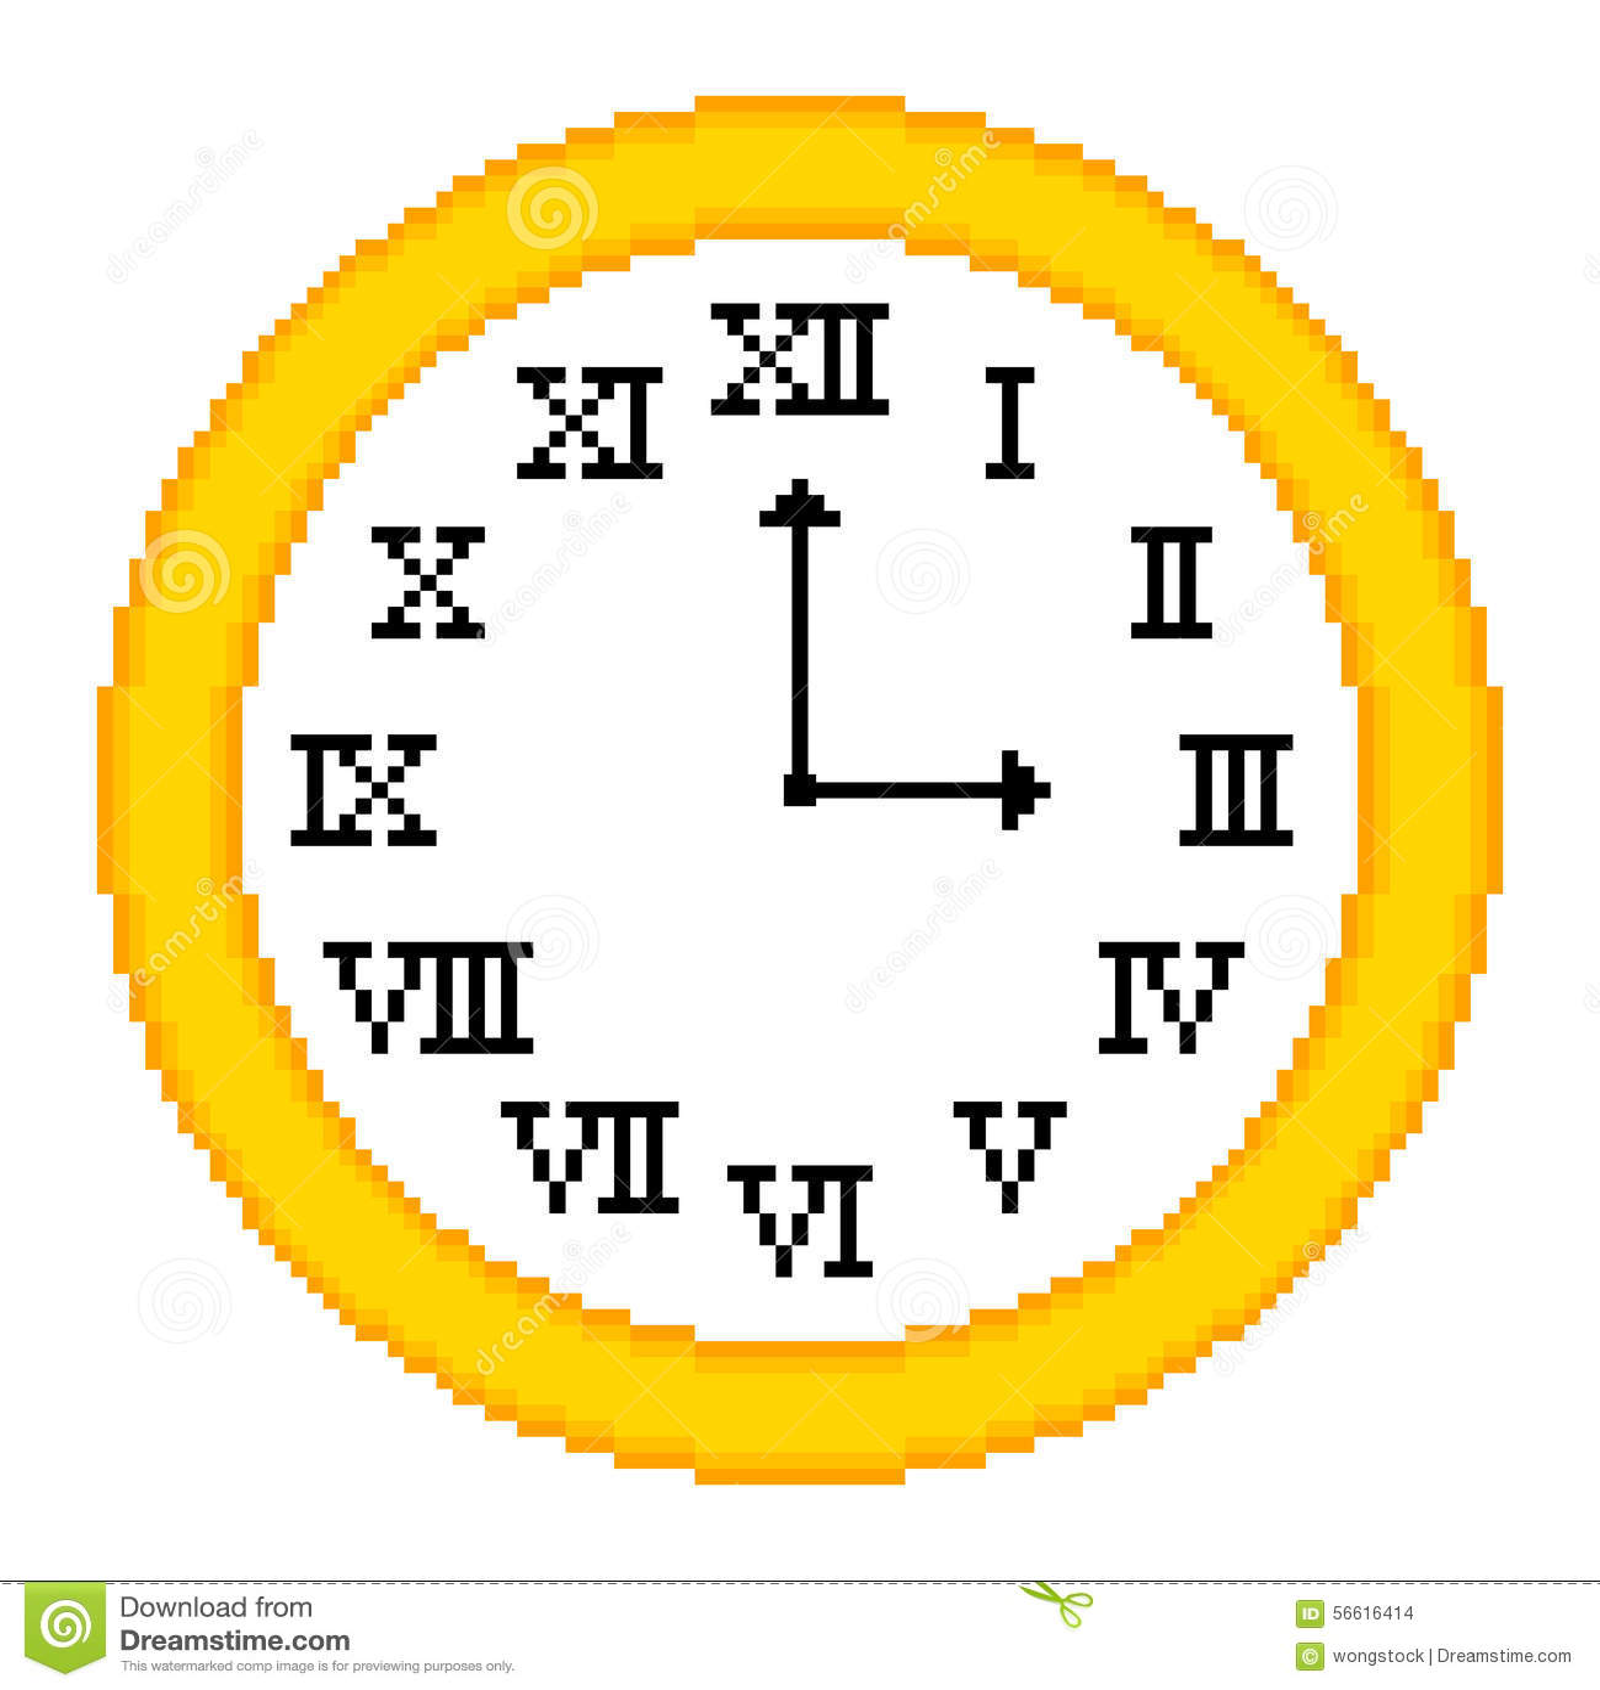 8 Bit Pixel Art Roman Numeral Clock Stock Vector Illustration Of - 3-roman-numerals-clocks